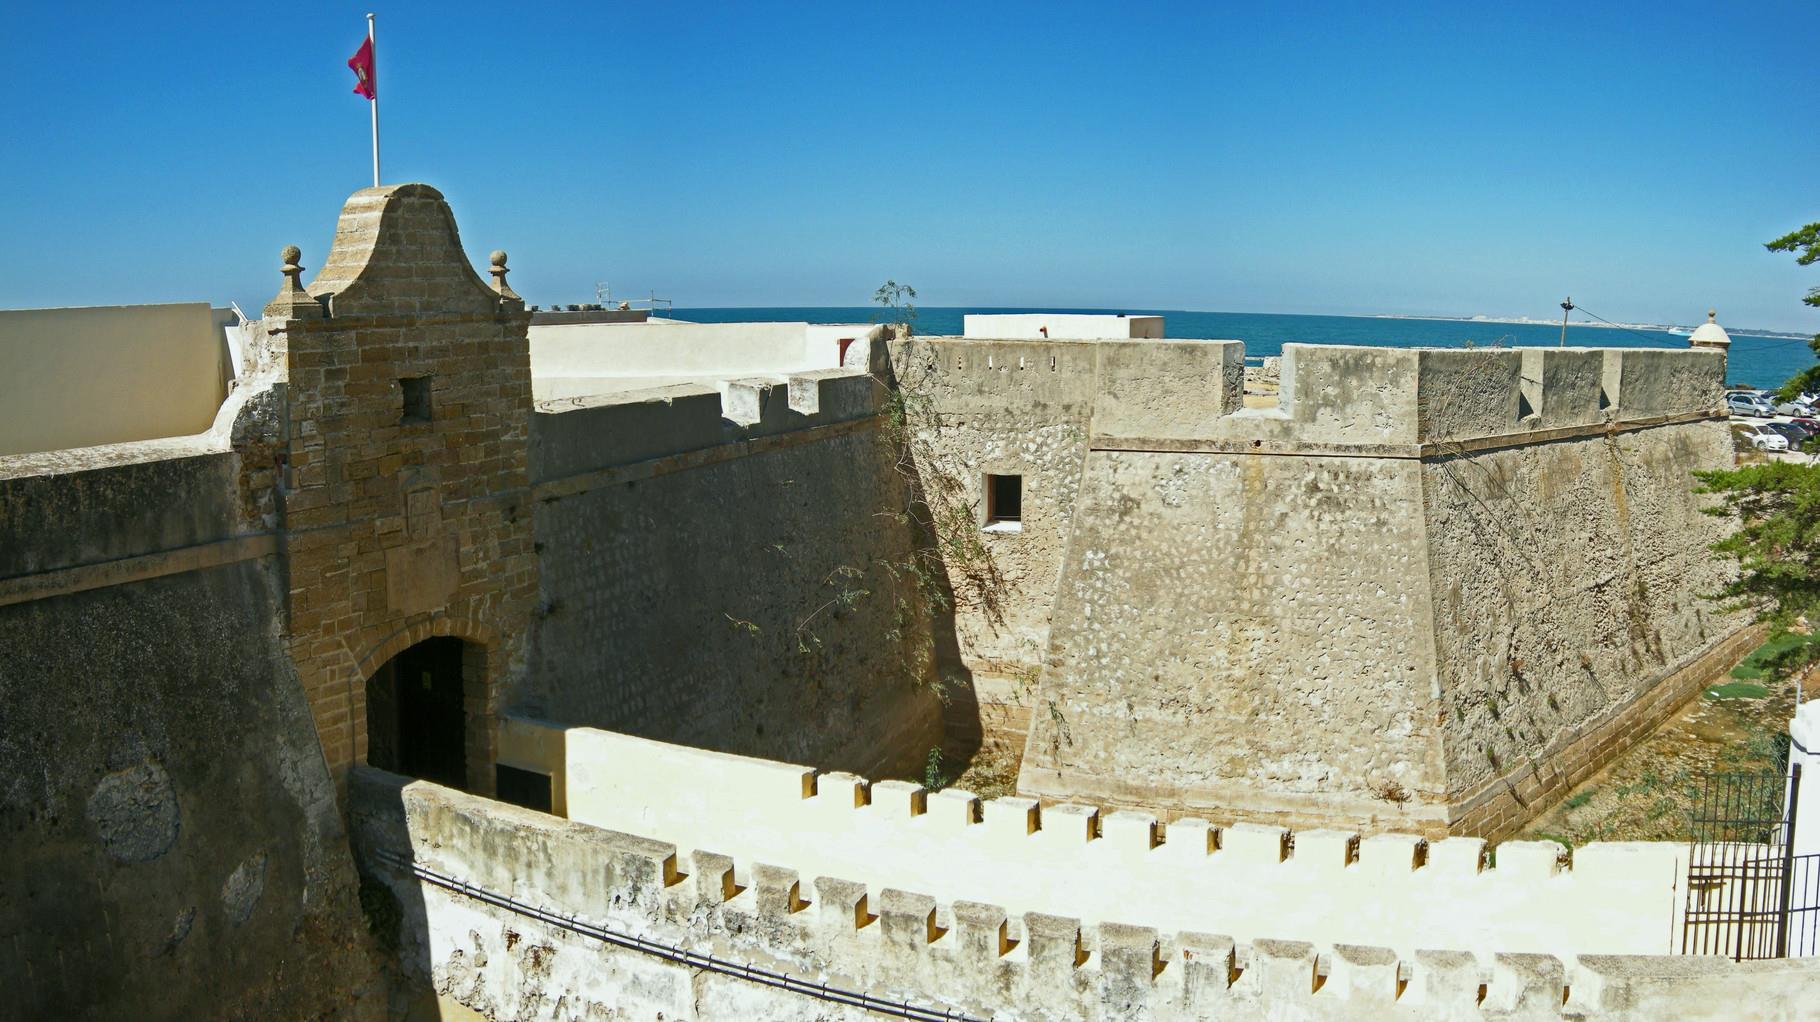 Tour-Castillos-y-Baluartes-de-Cadiz-15